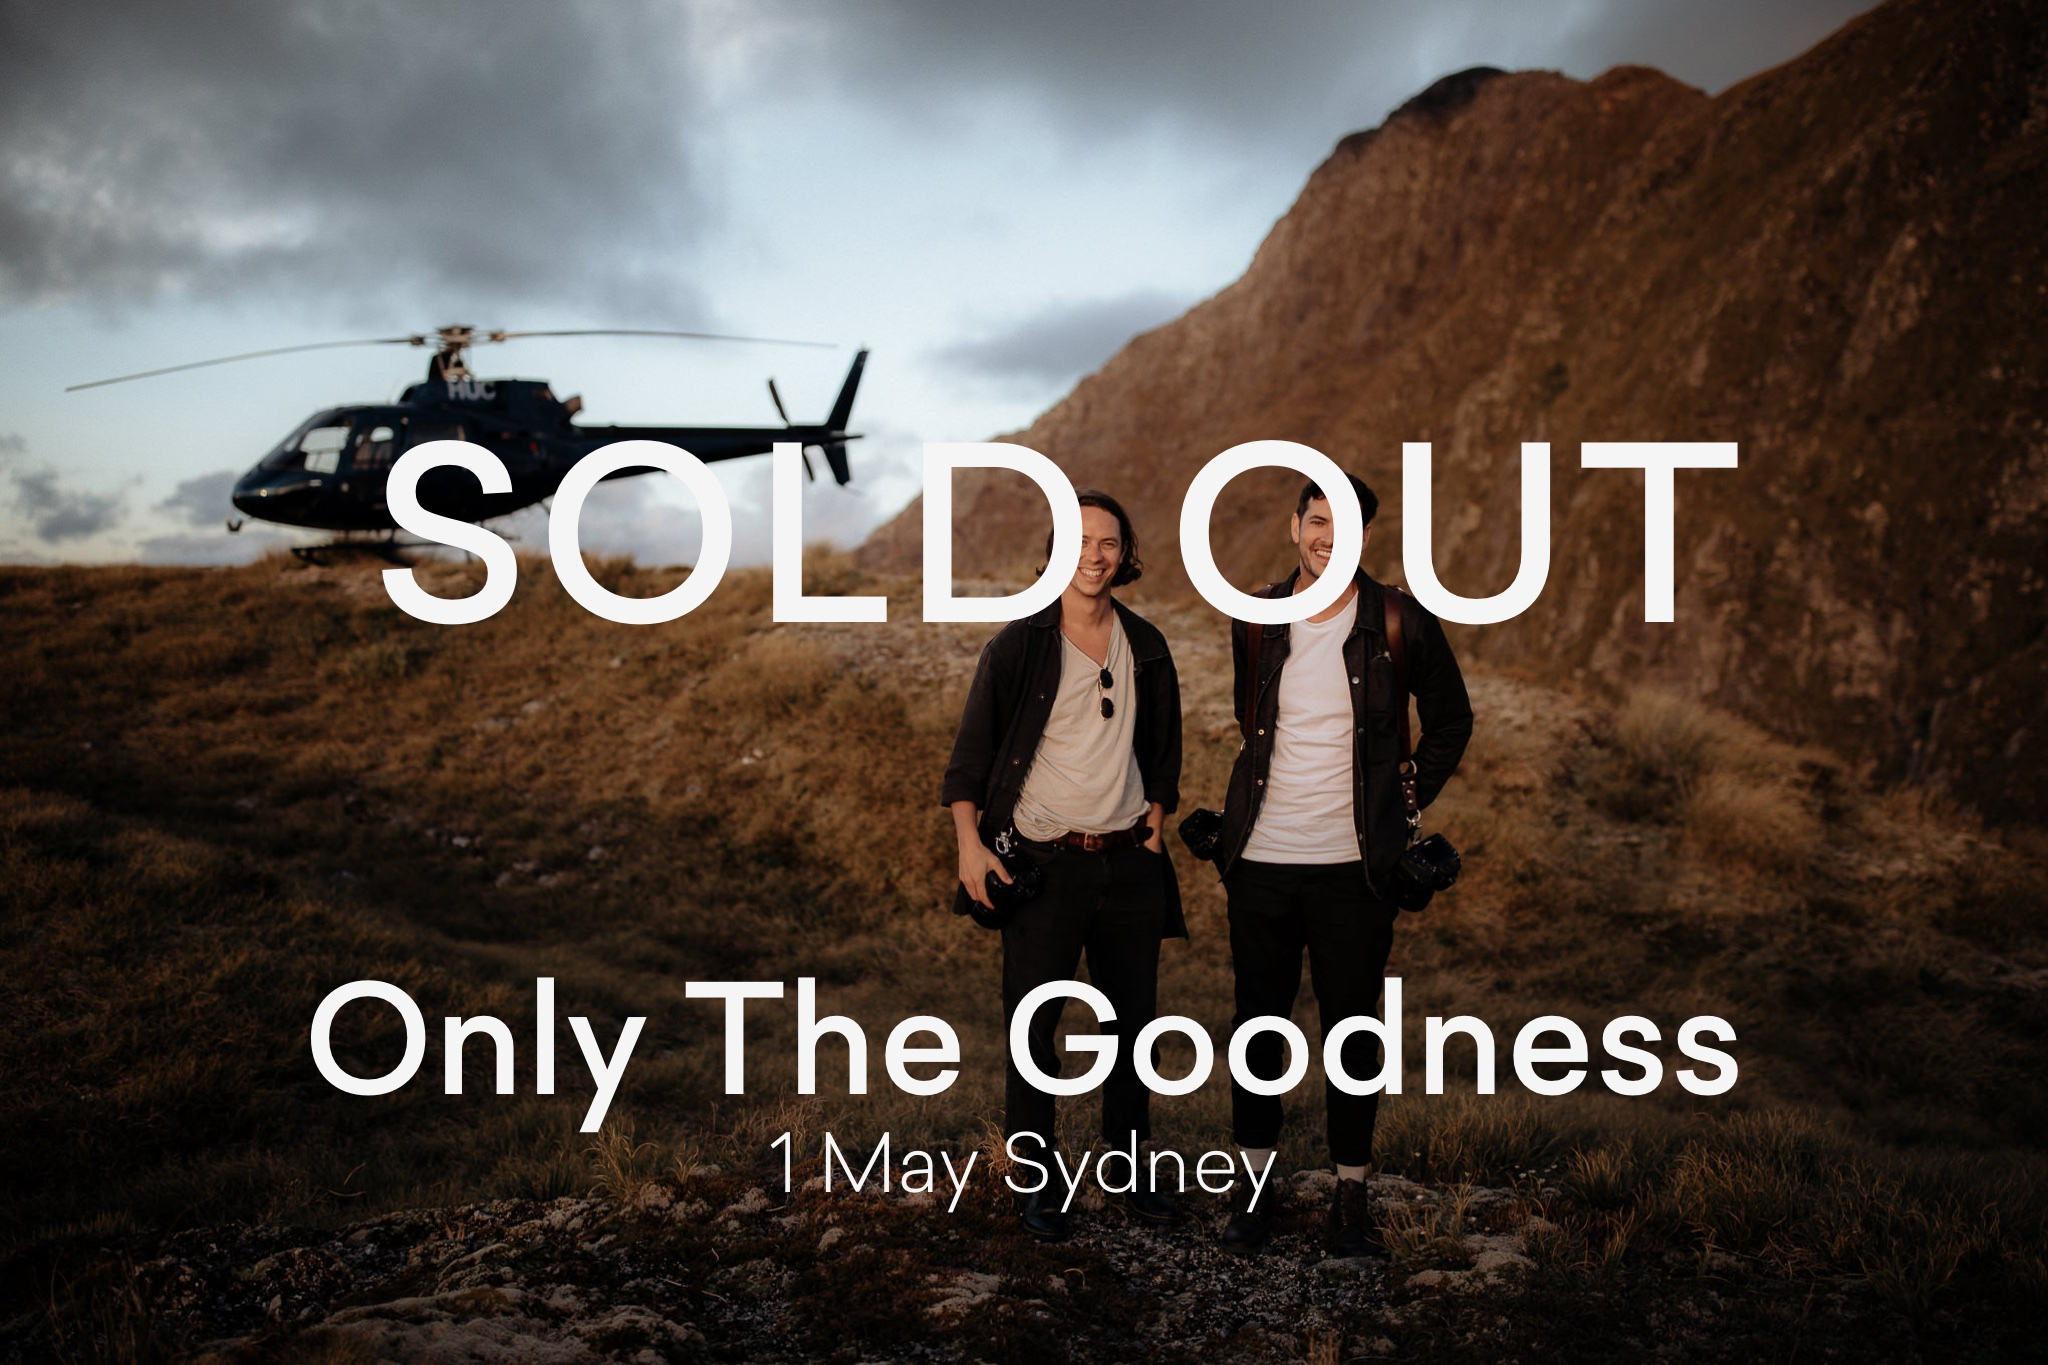 1 May 2018 Sydney